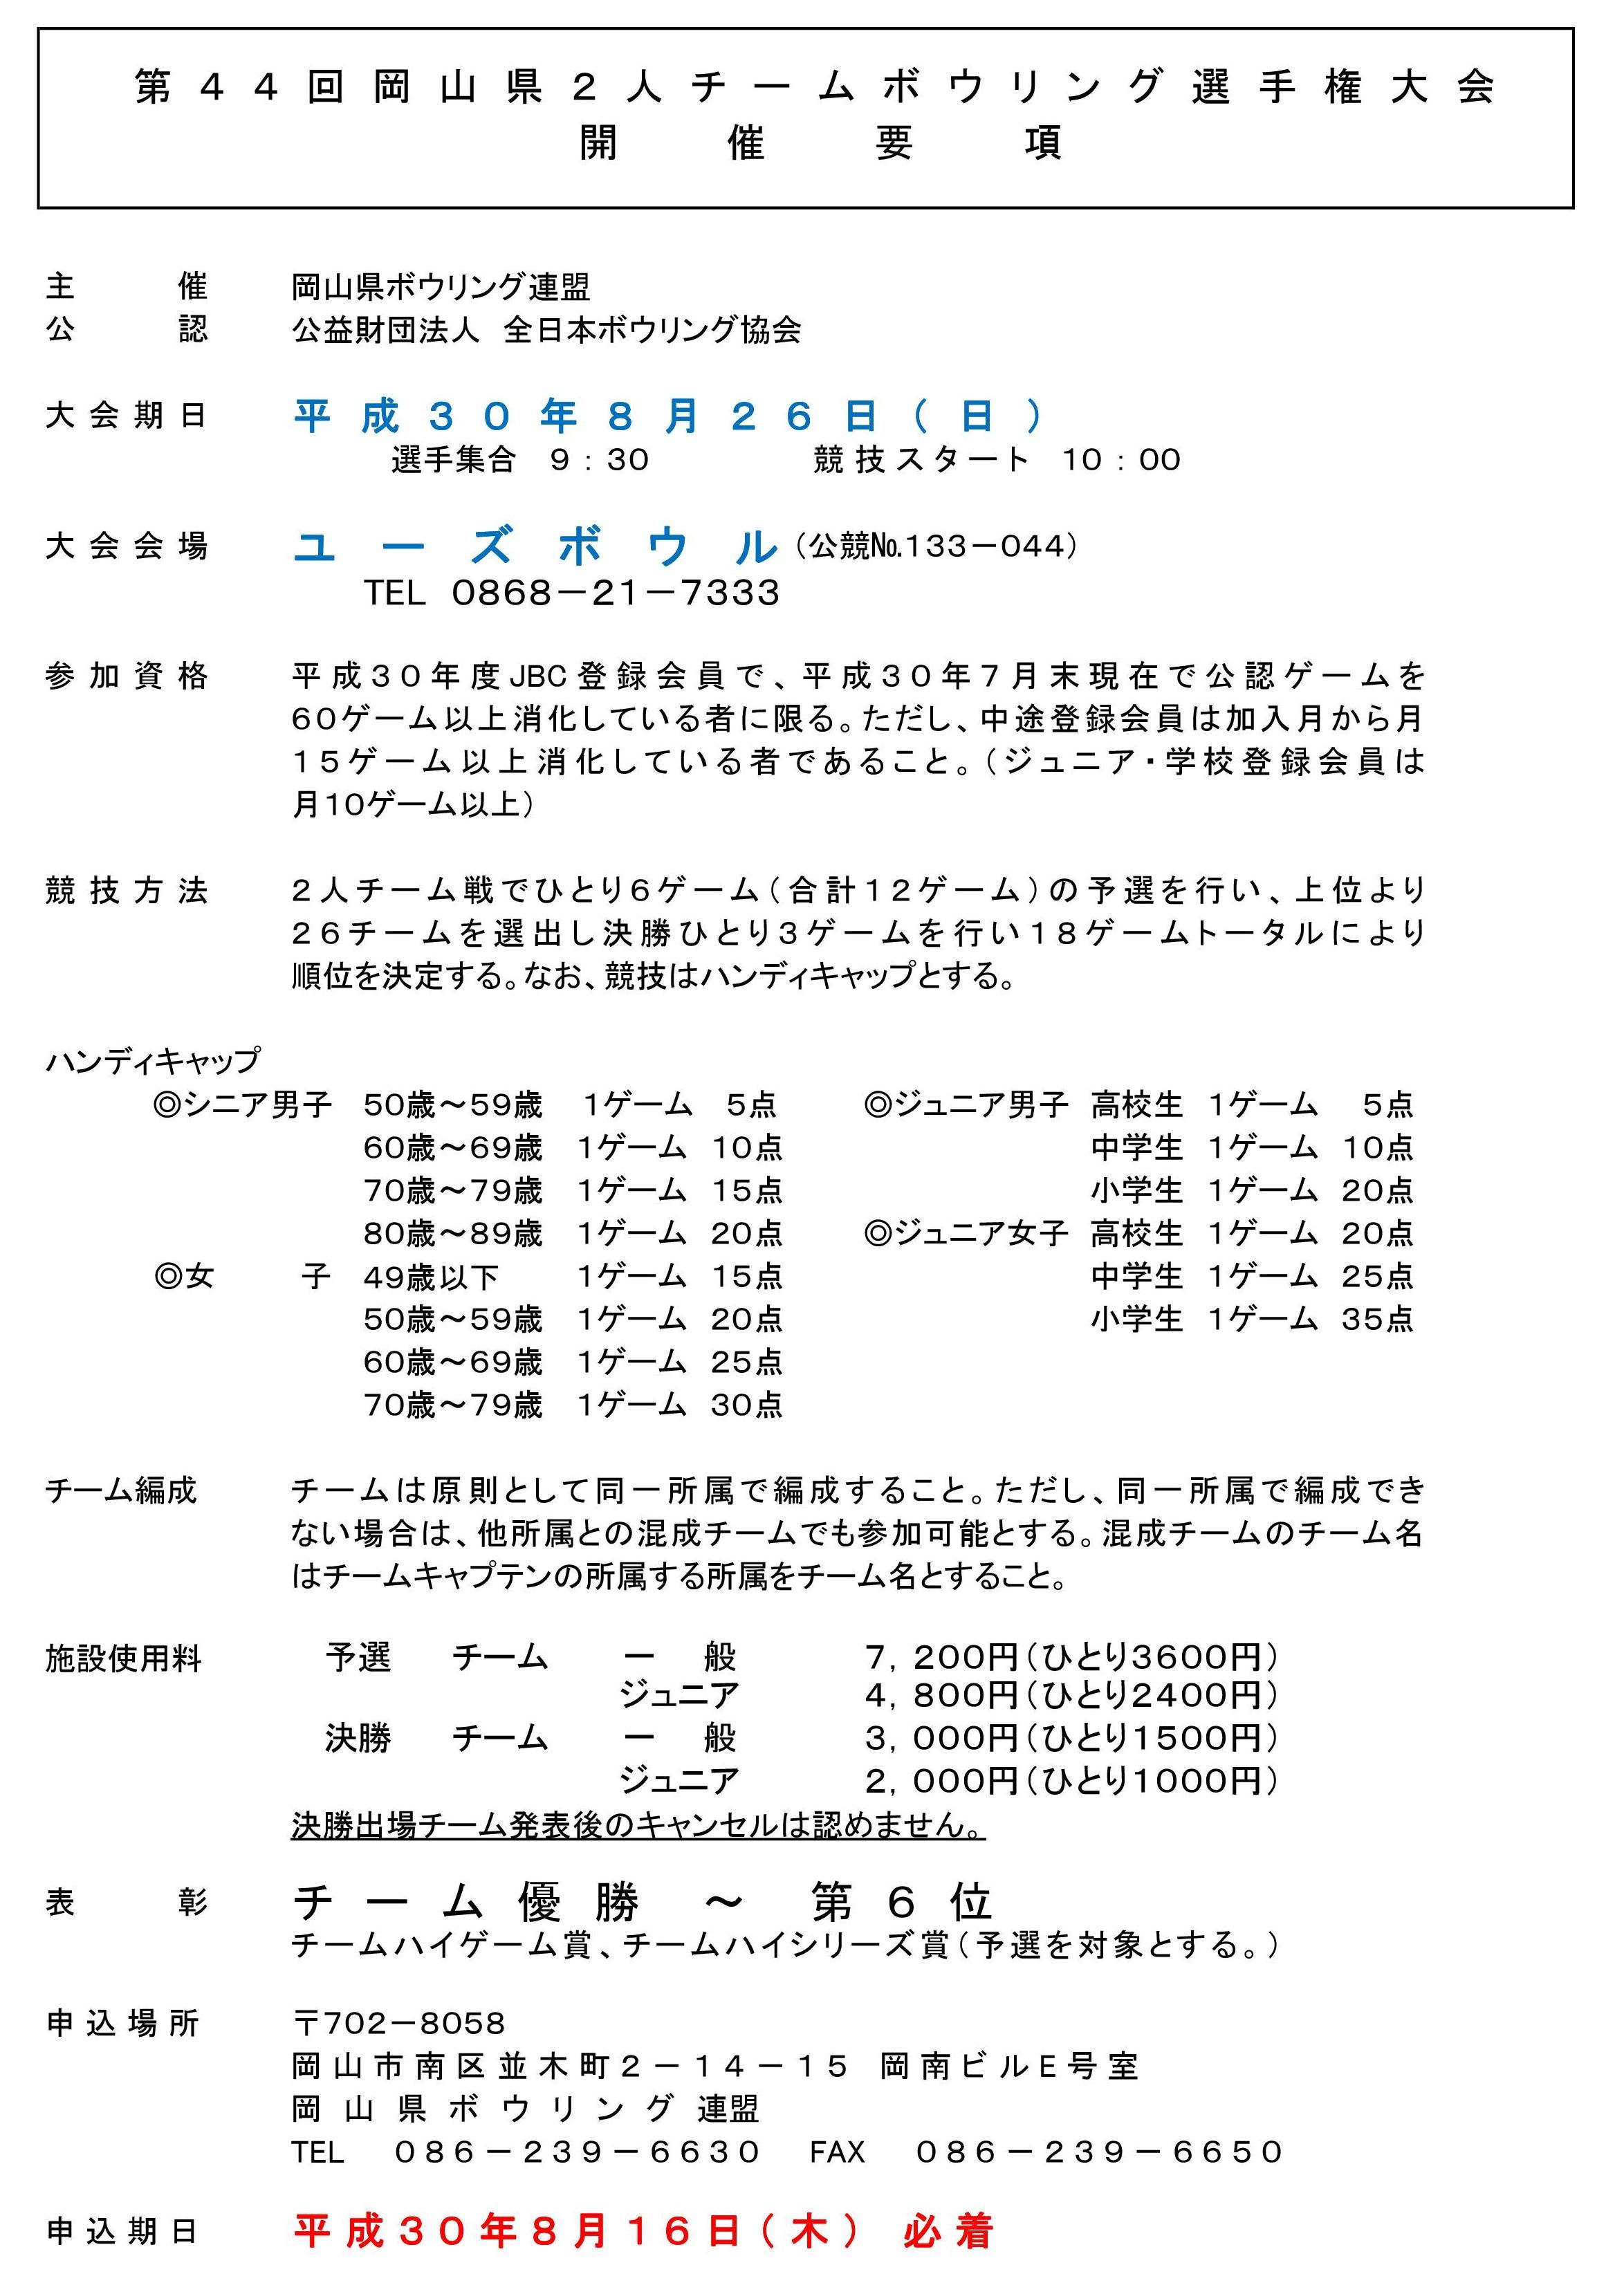 17.2人チーム選手権大会.jpg